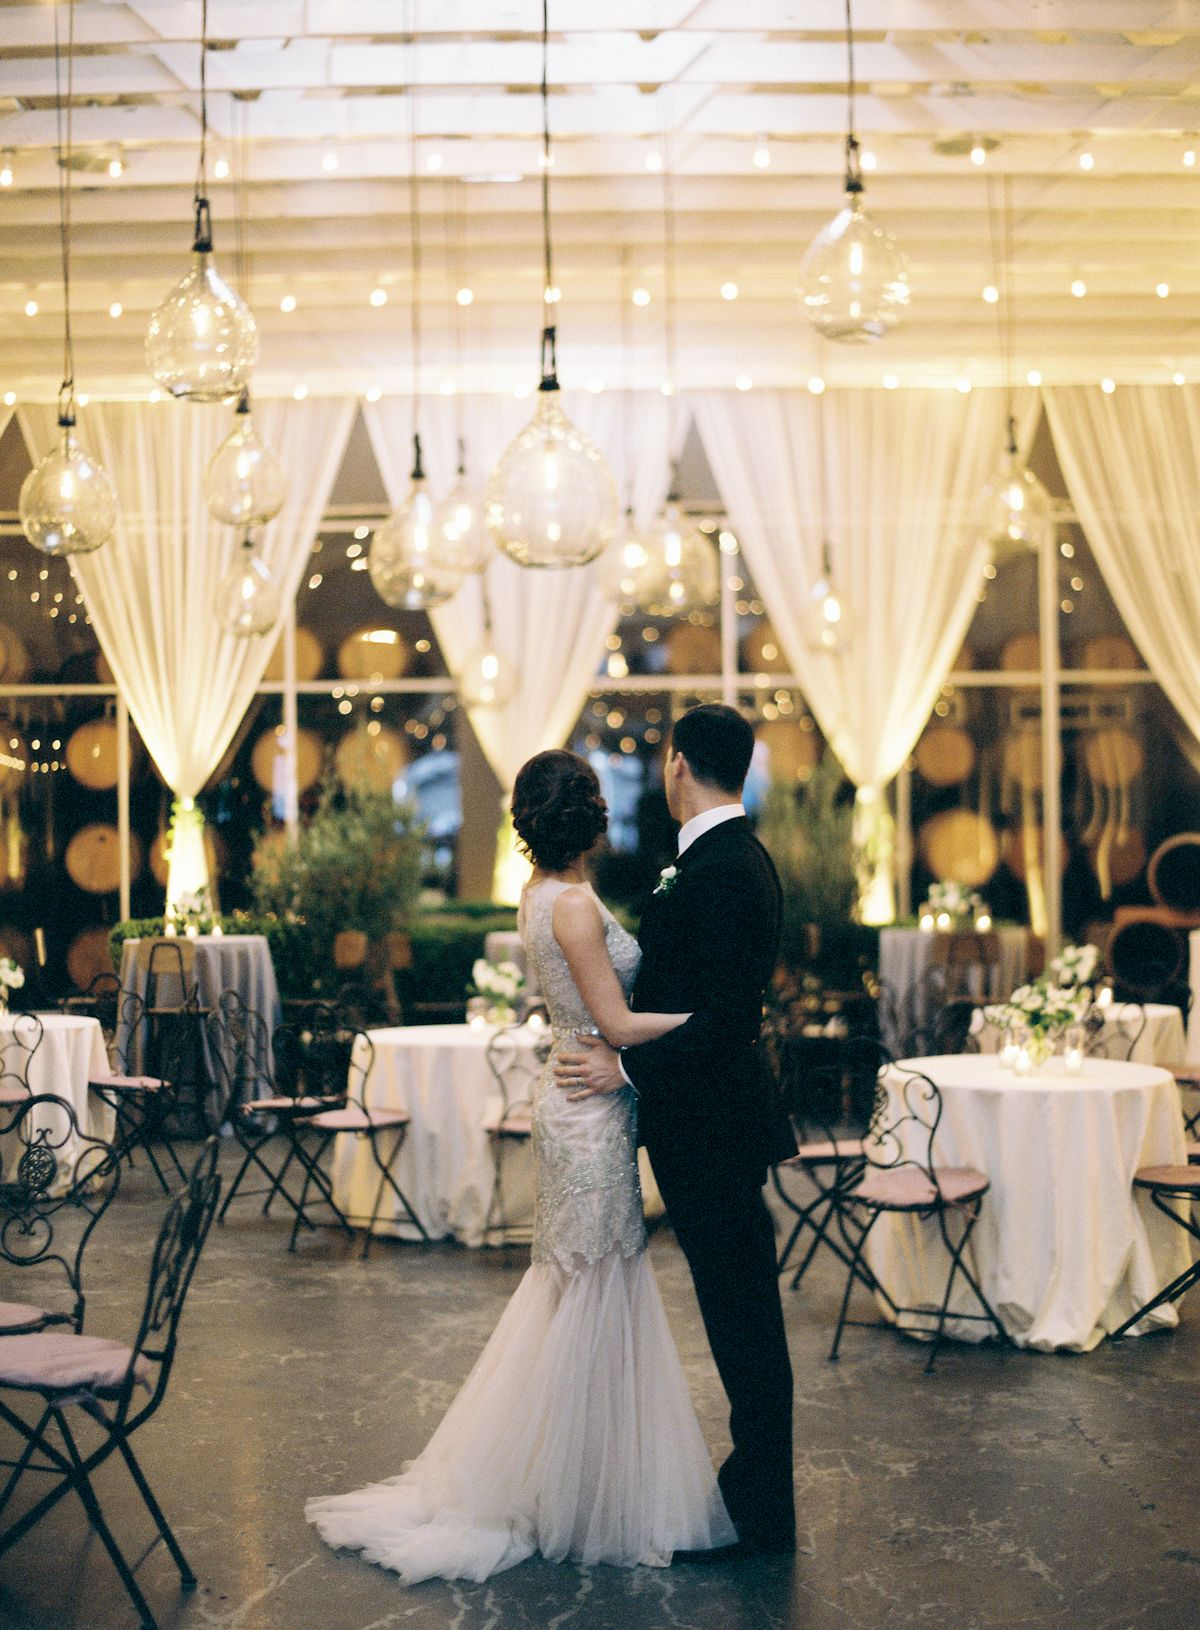 Jen Huang San Francisco Wedding California Northern Bluxome Street Winery